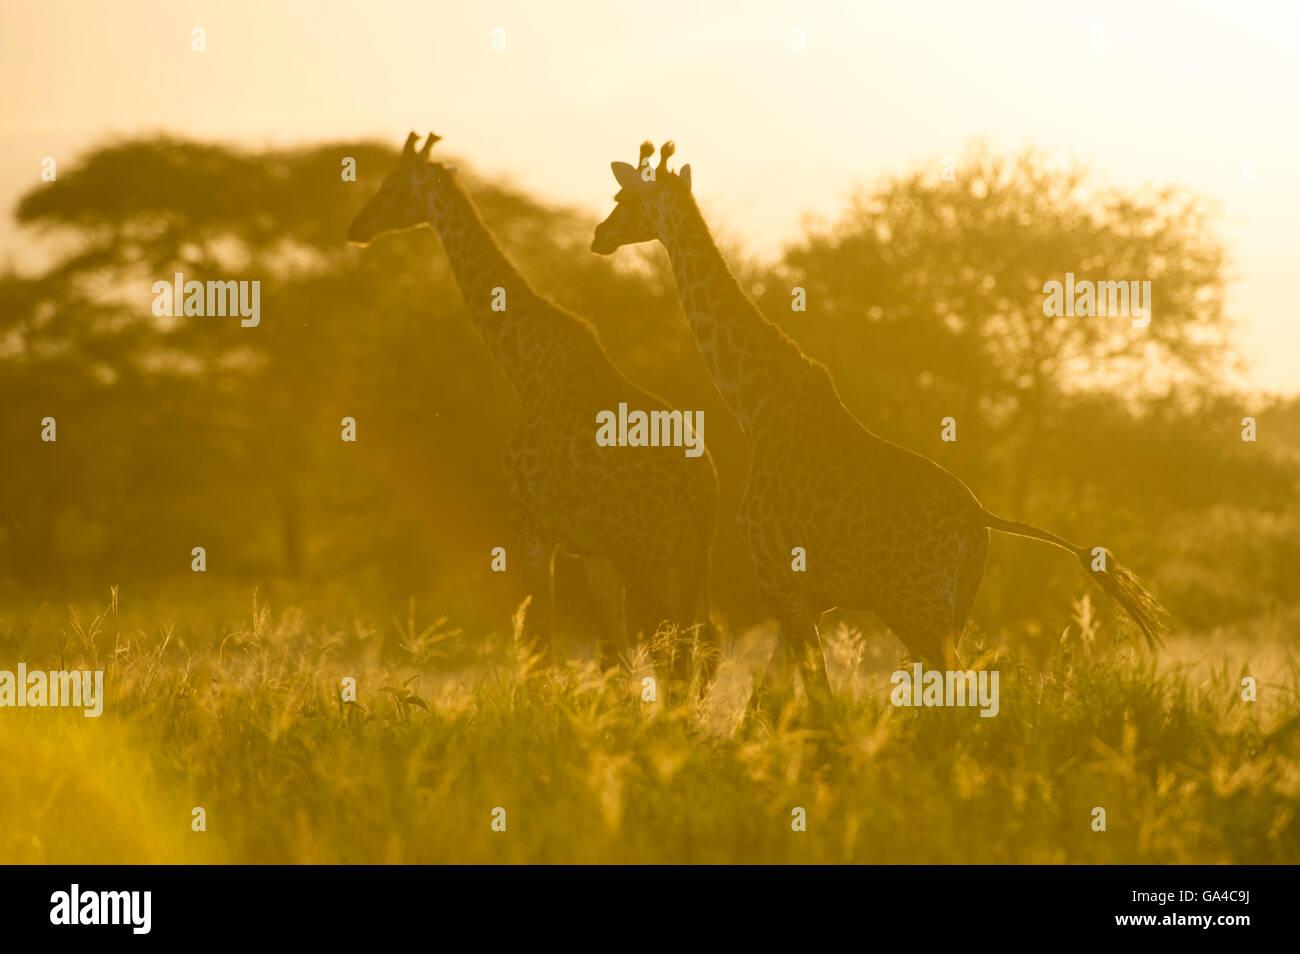 Maasai giraffe at sunset (Giraffa camelopardalis tippelskirchi), Tarangire National Park, Tanzania - Stock Image